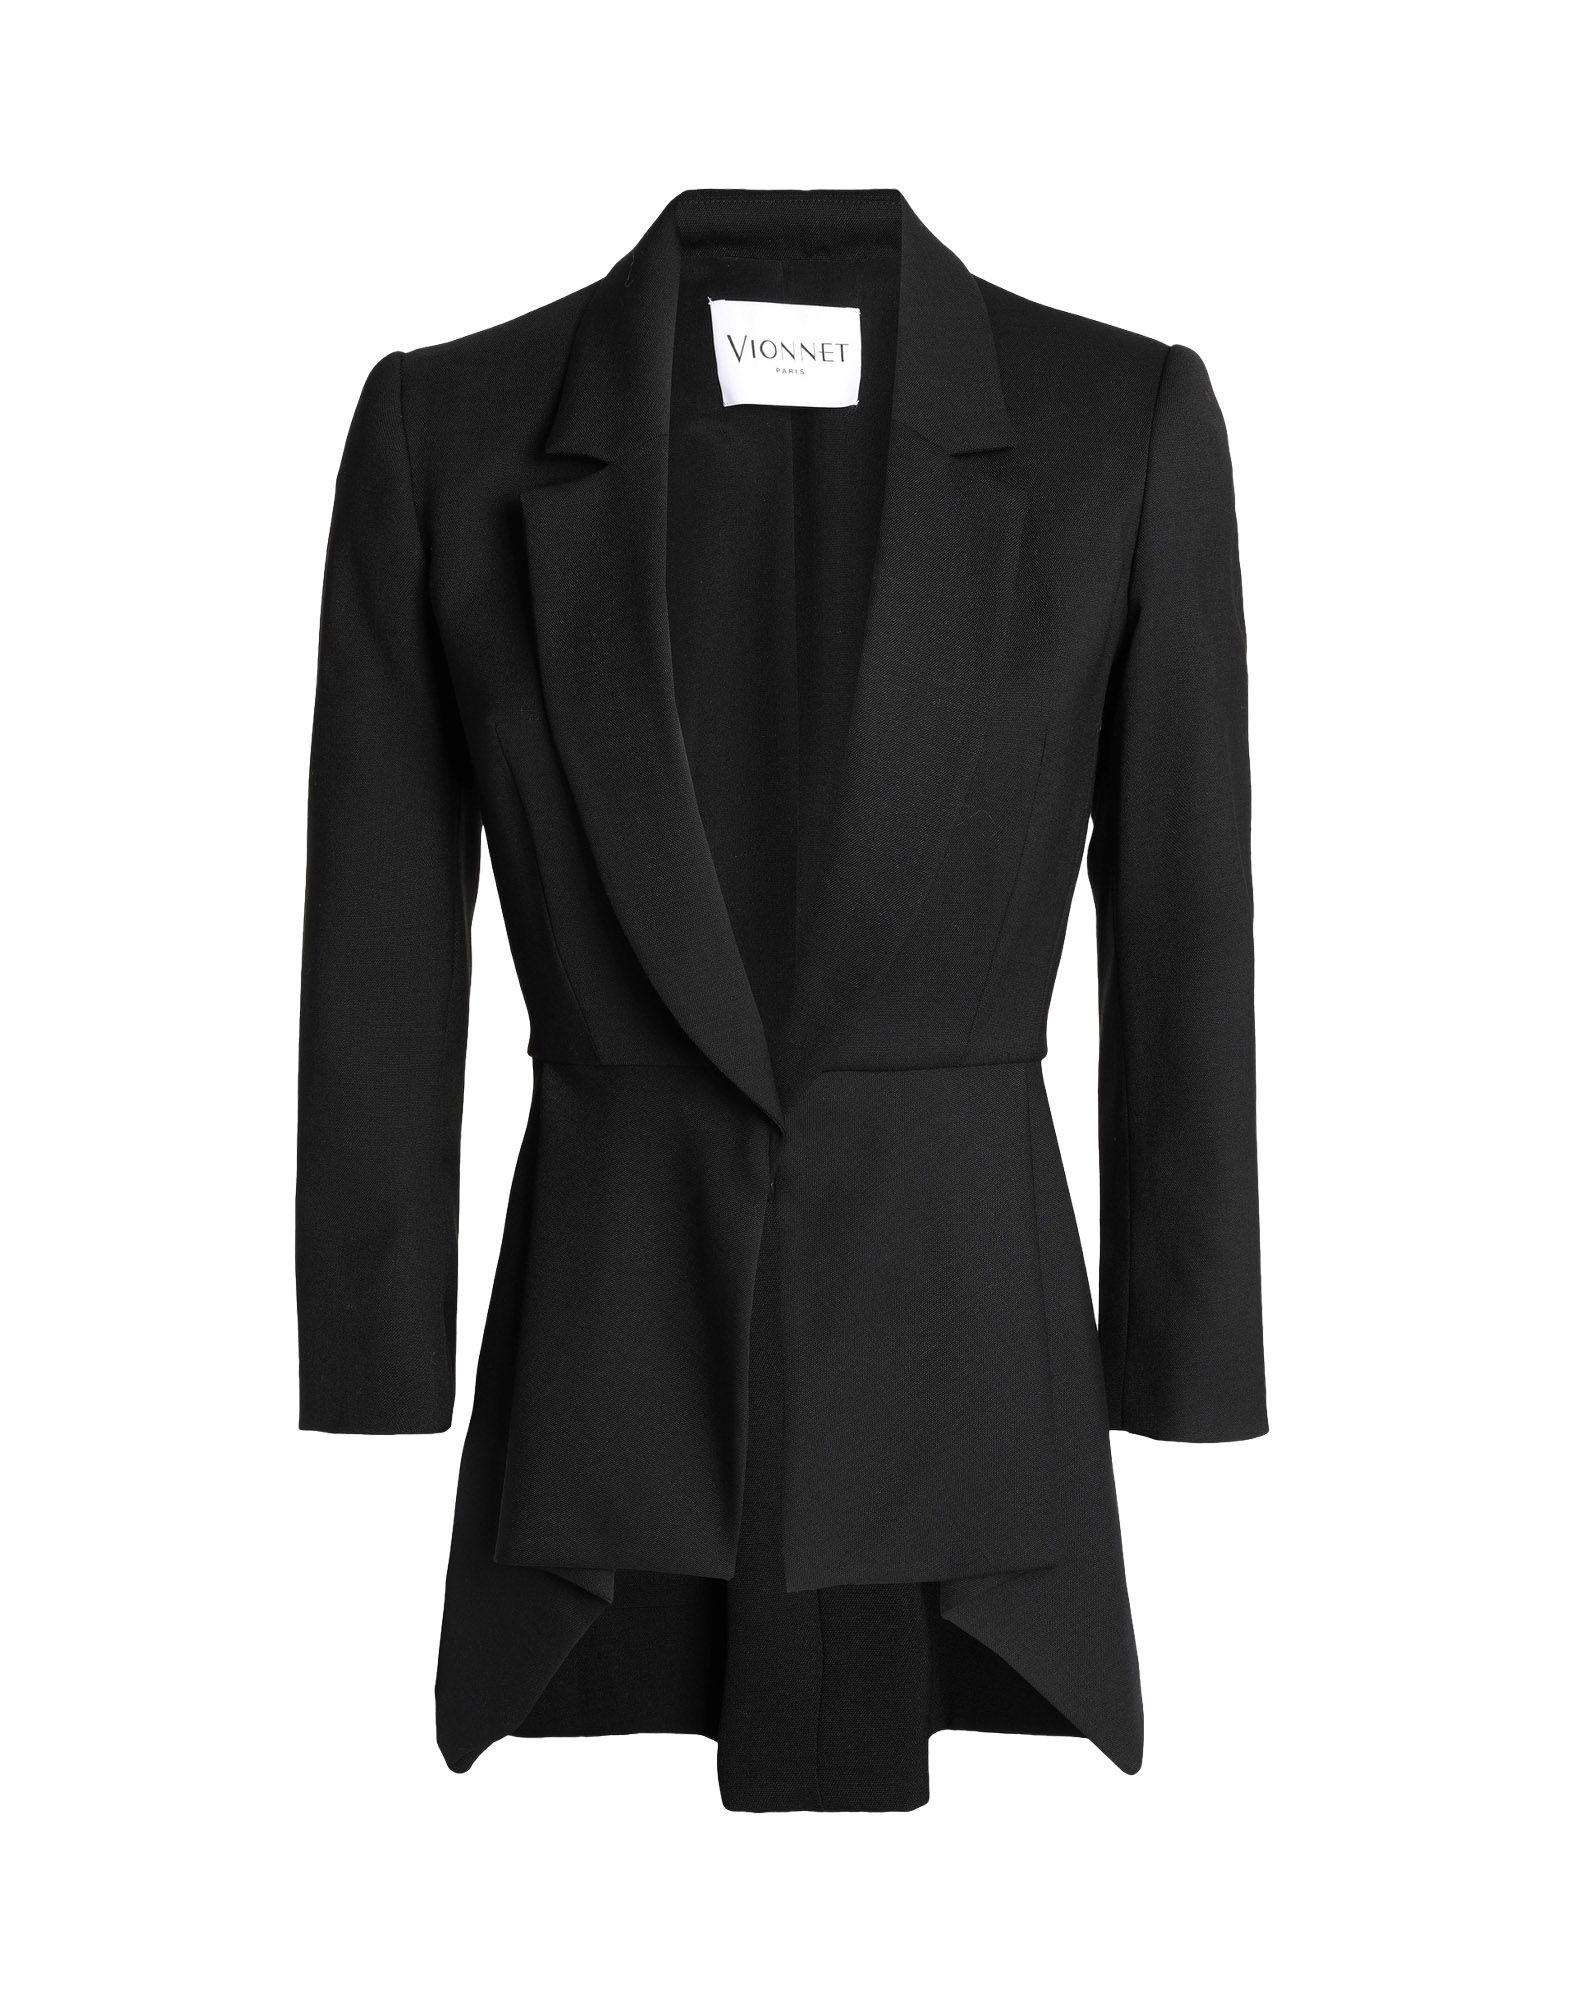 VIONNET Blazer in Black